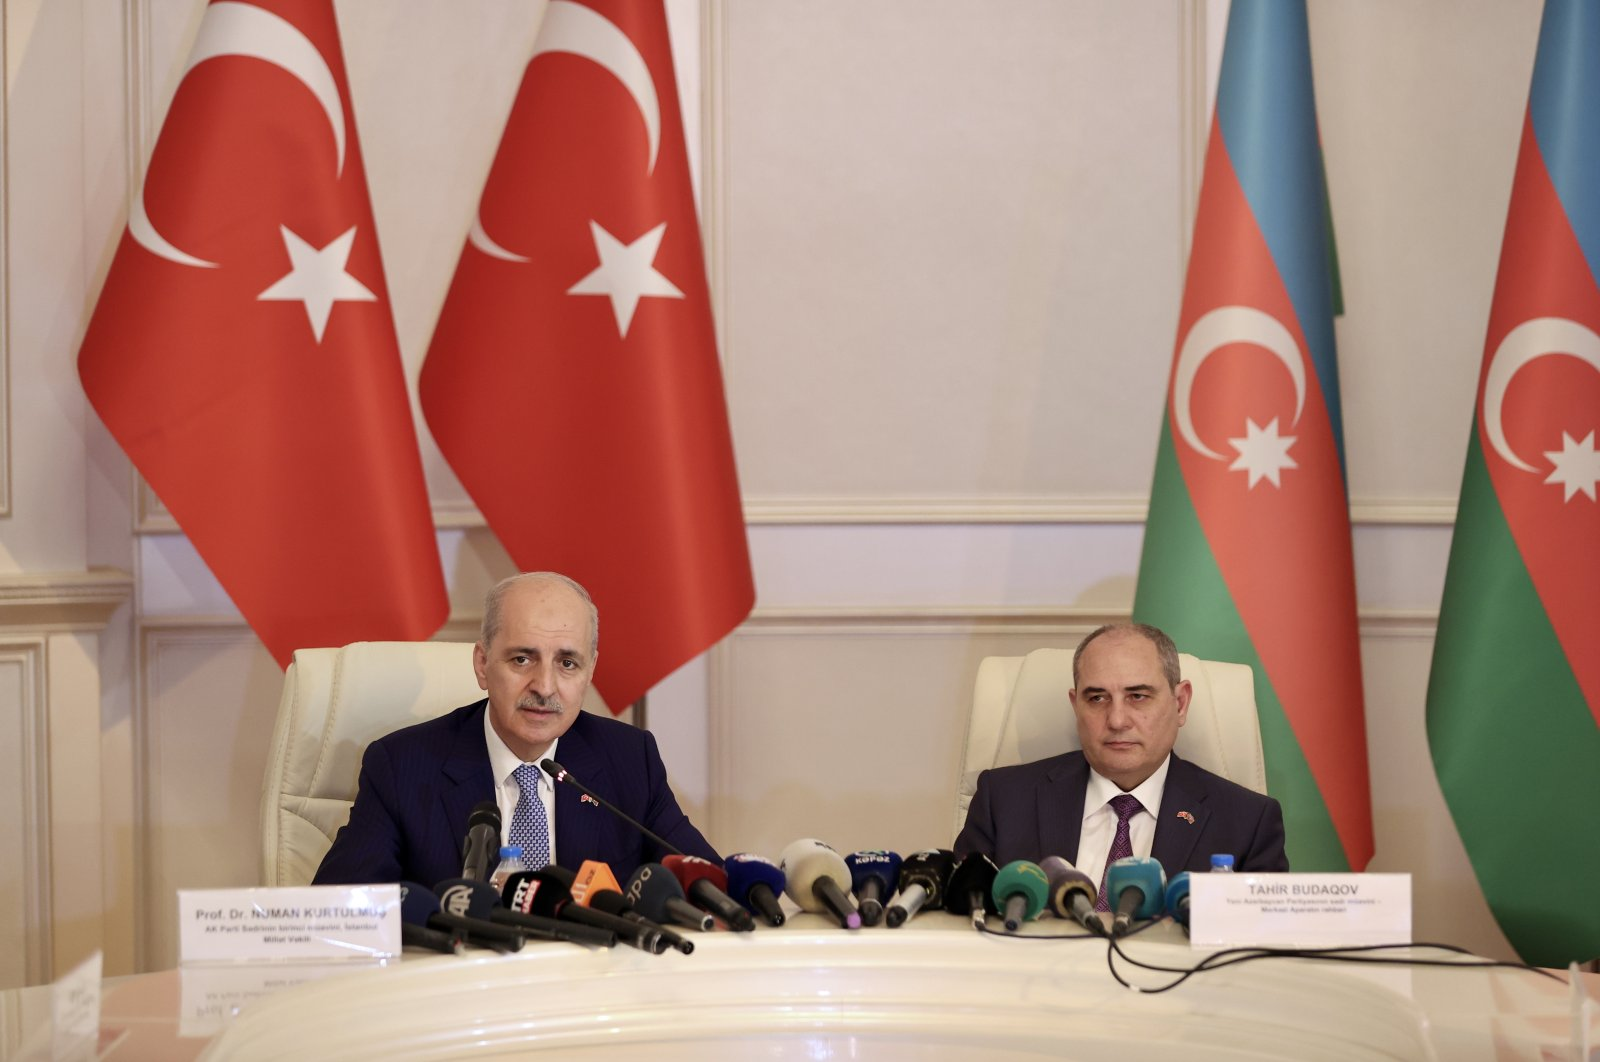 Turkey's ruling Justice and Development Party (AK Party) Deputy Chair Numan Kurtulmuş (R) and New Azerbaijan Party (YAP) Deputy Chairprson Tahir Budagov in Baku, Azerbaijan, July 28, 2021. (AA Photo)